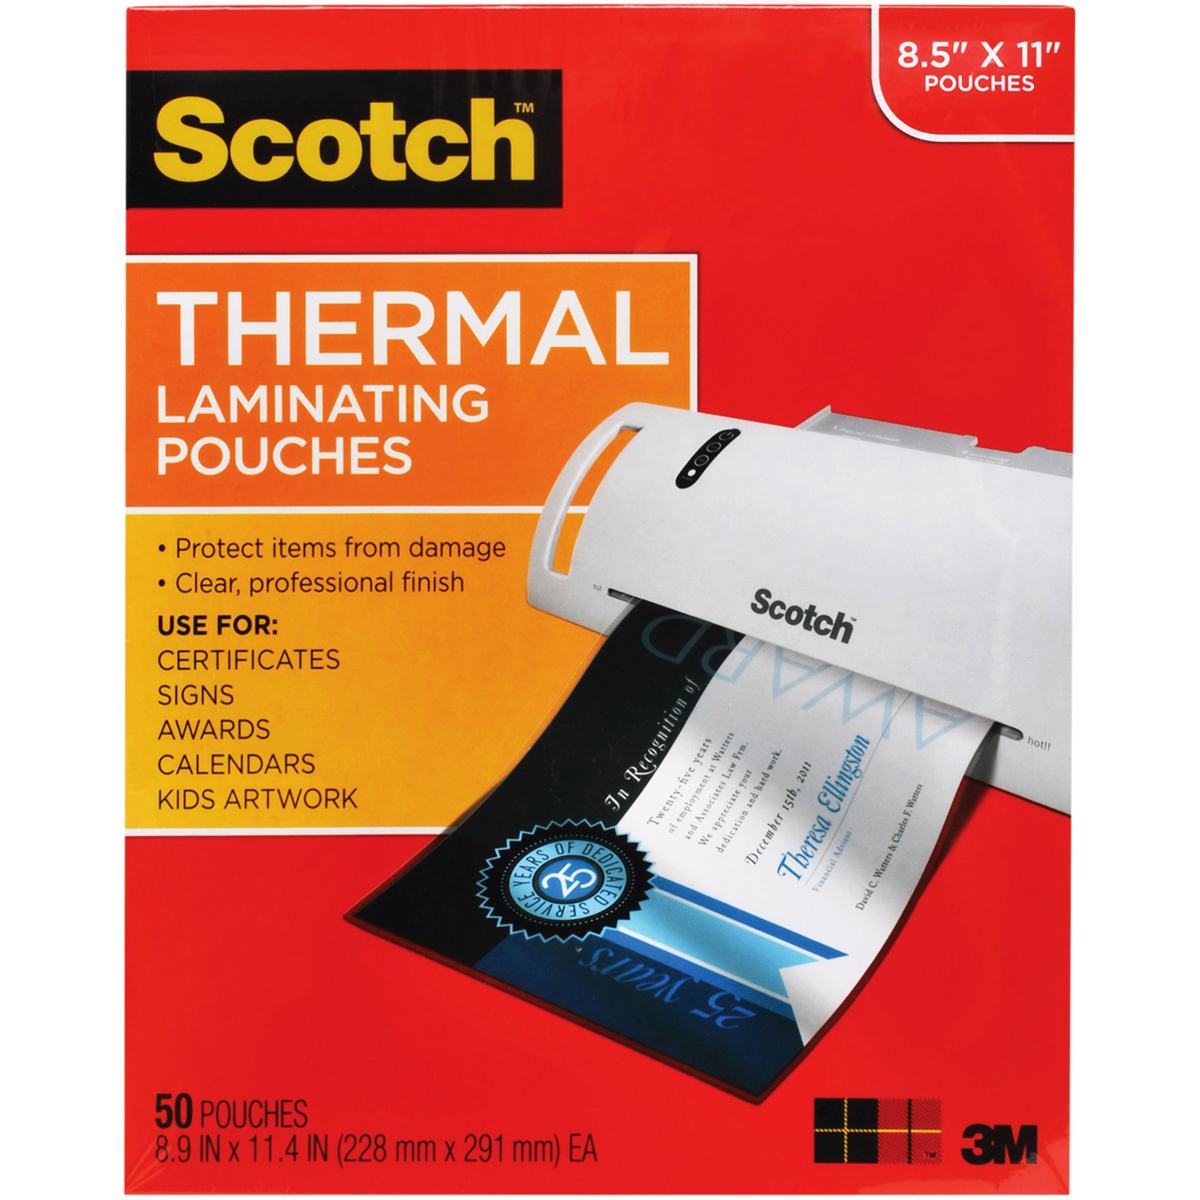 Scotch Laminating Pouches 8.5x11 50pc